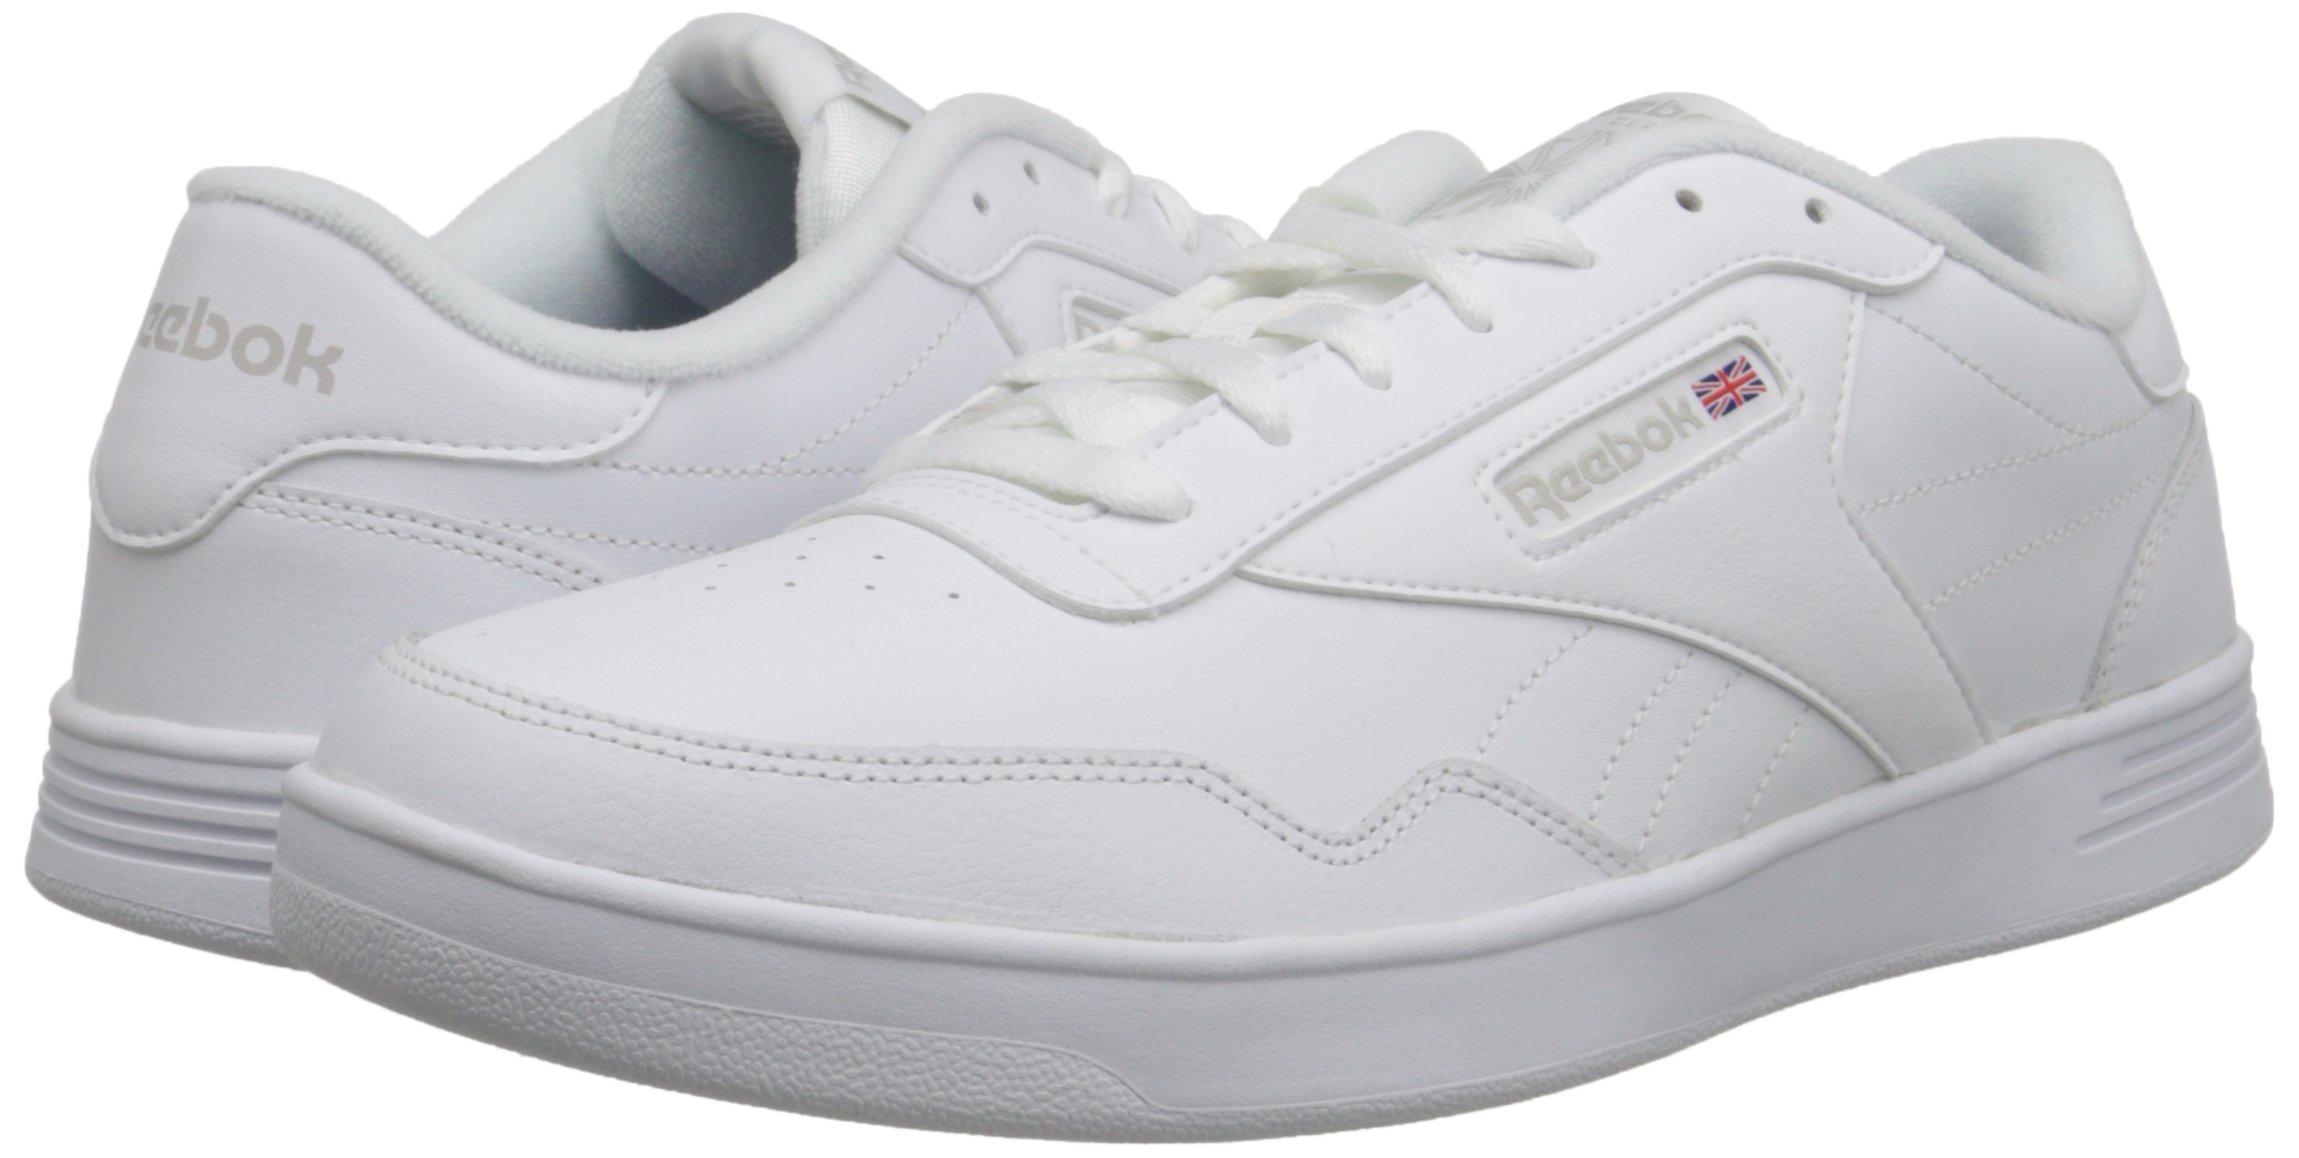 5b8ca0965 Reebok Men s Club MEMT Fashion Sneaker